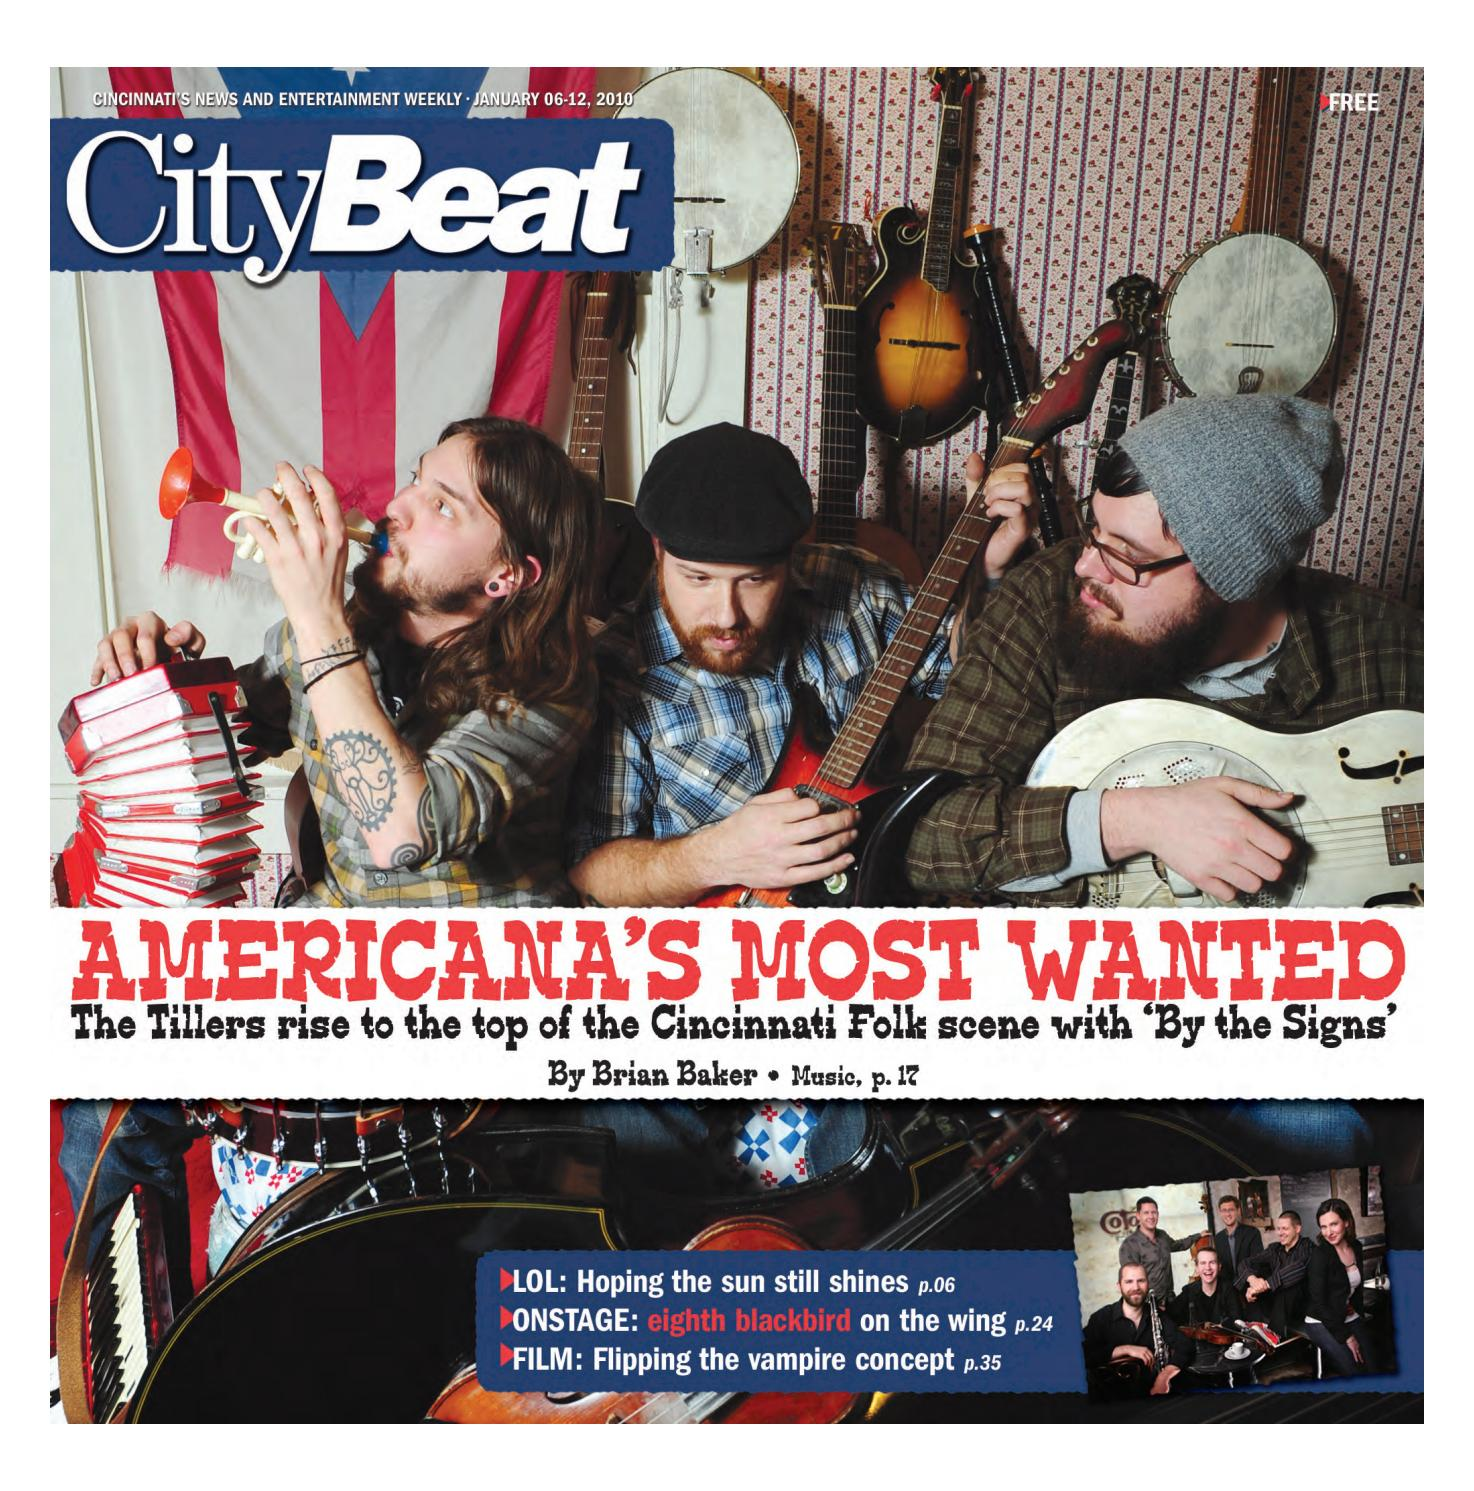 Citybeat Jan 6 2010 By Euclid Media Group Issuu